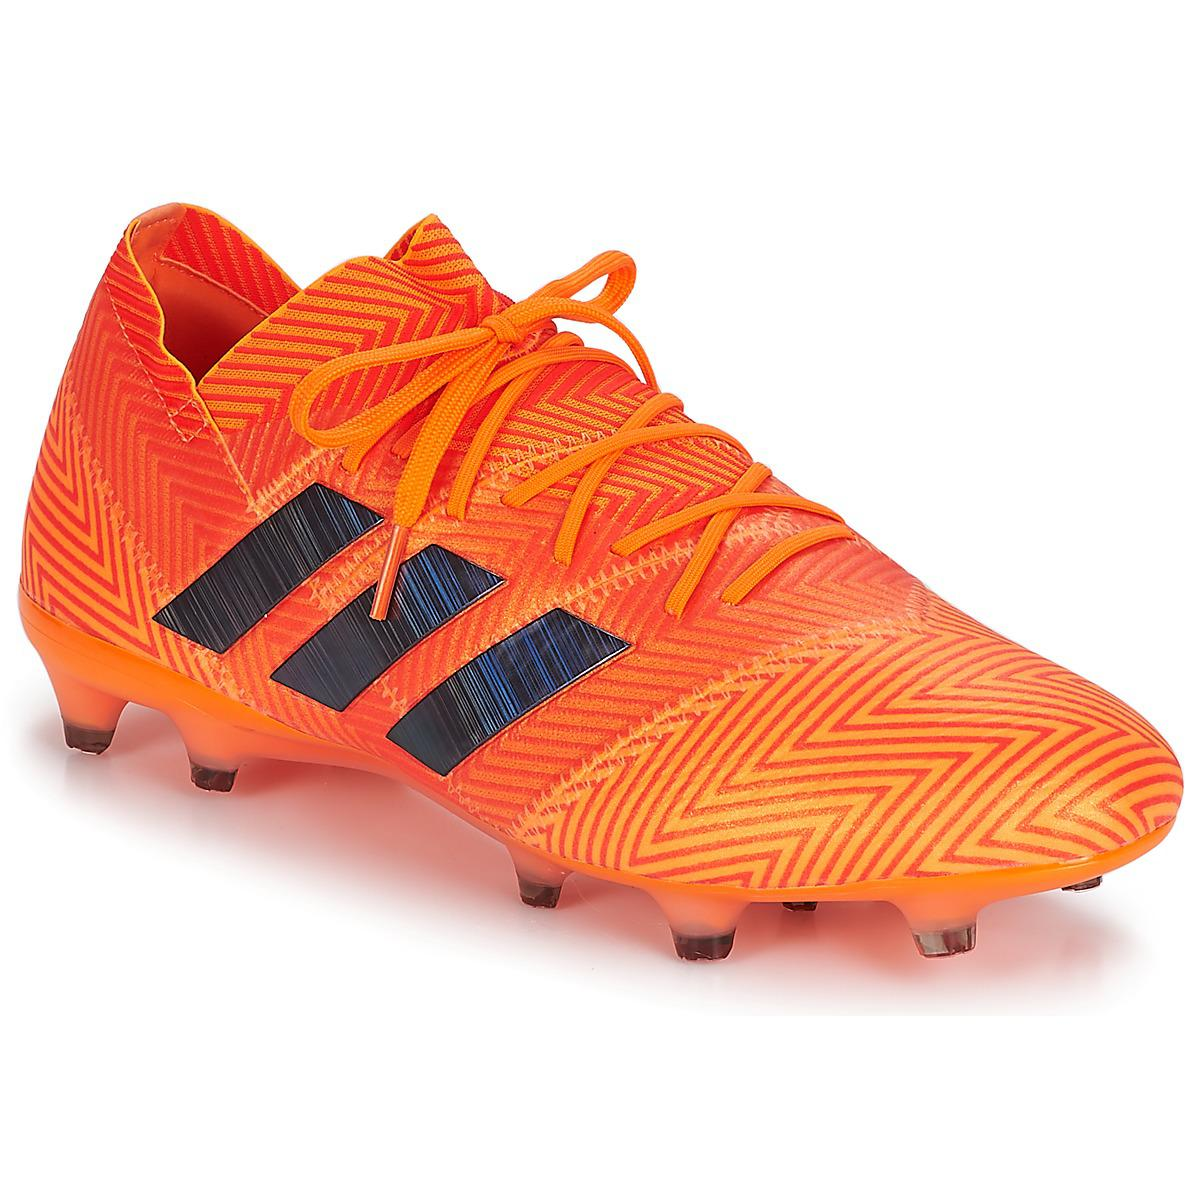 huge selection of b24b3 03950 adidas. Nemeziz 18.1 Fg Mens Football Boots In Orange